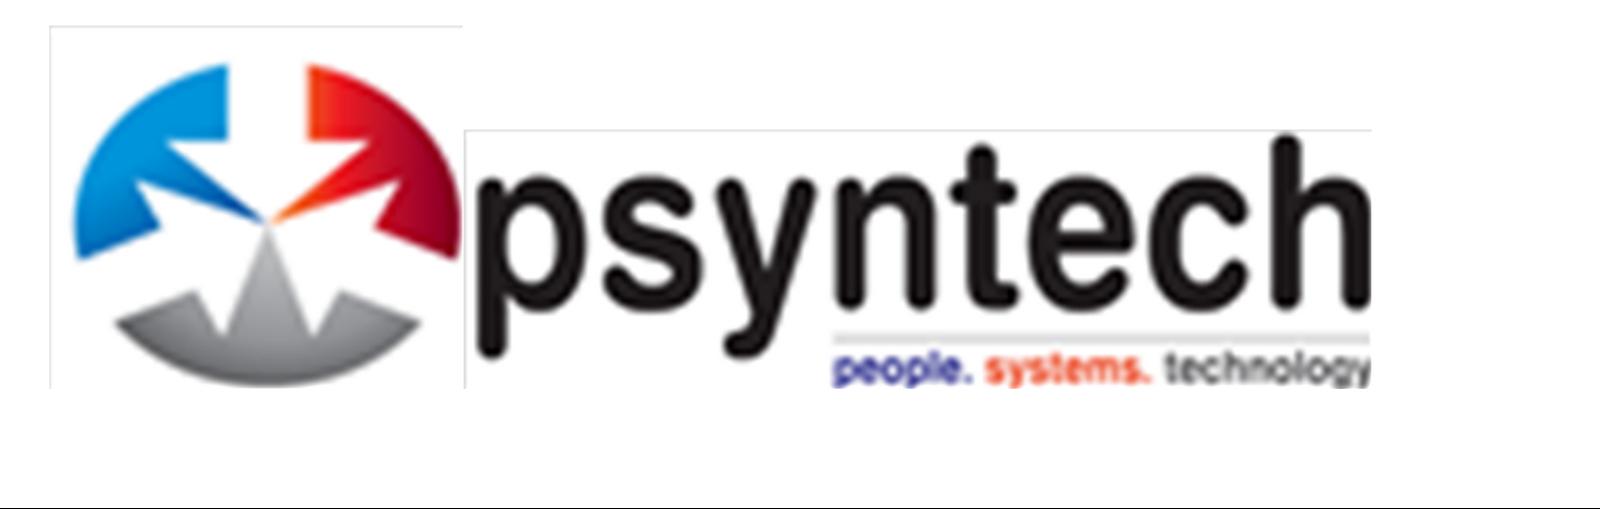 Job for Nigerians  Online Jobs for Nigerians Psyntech